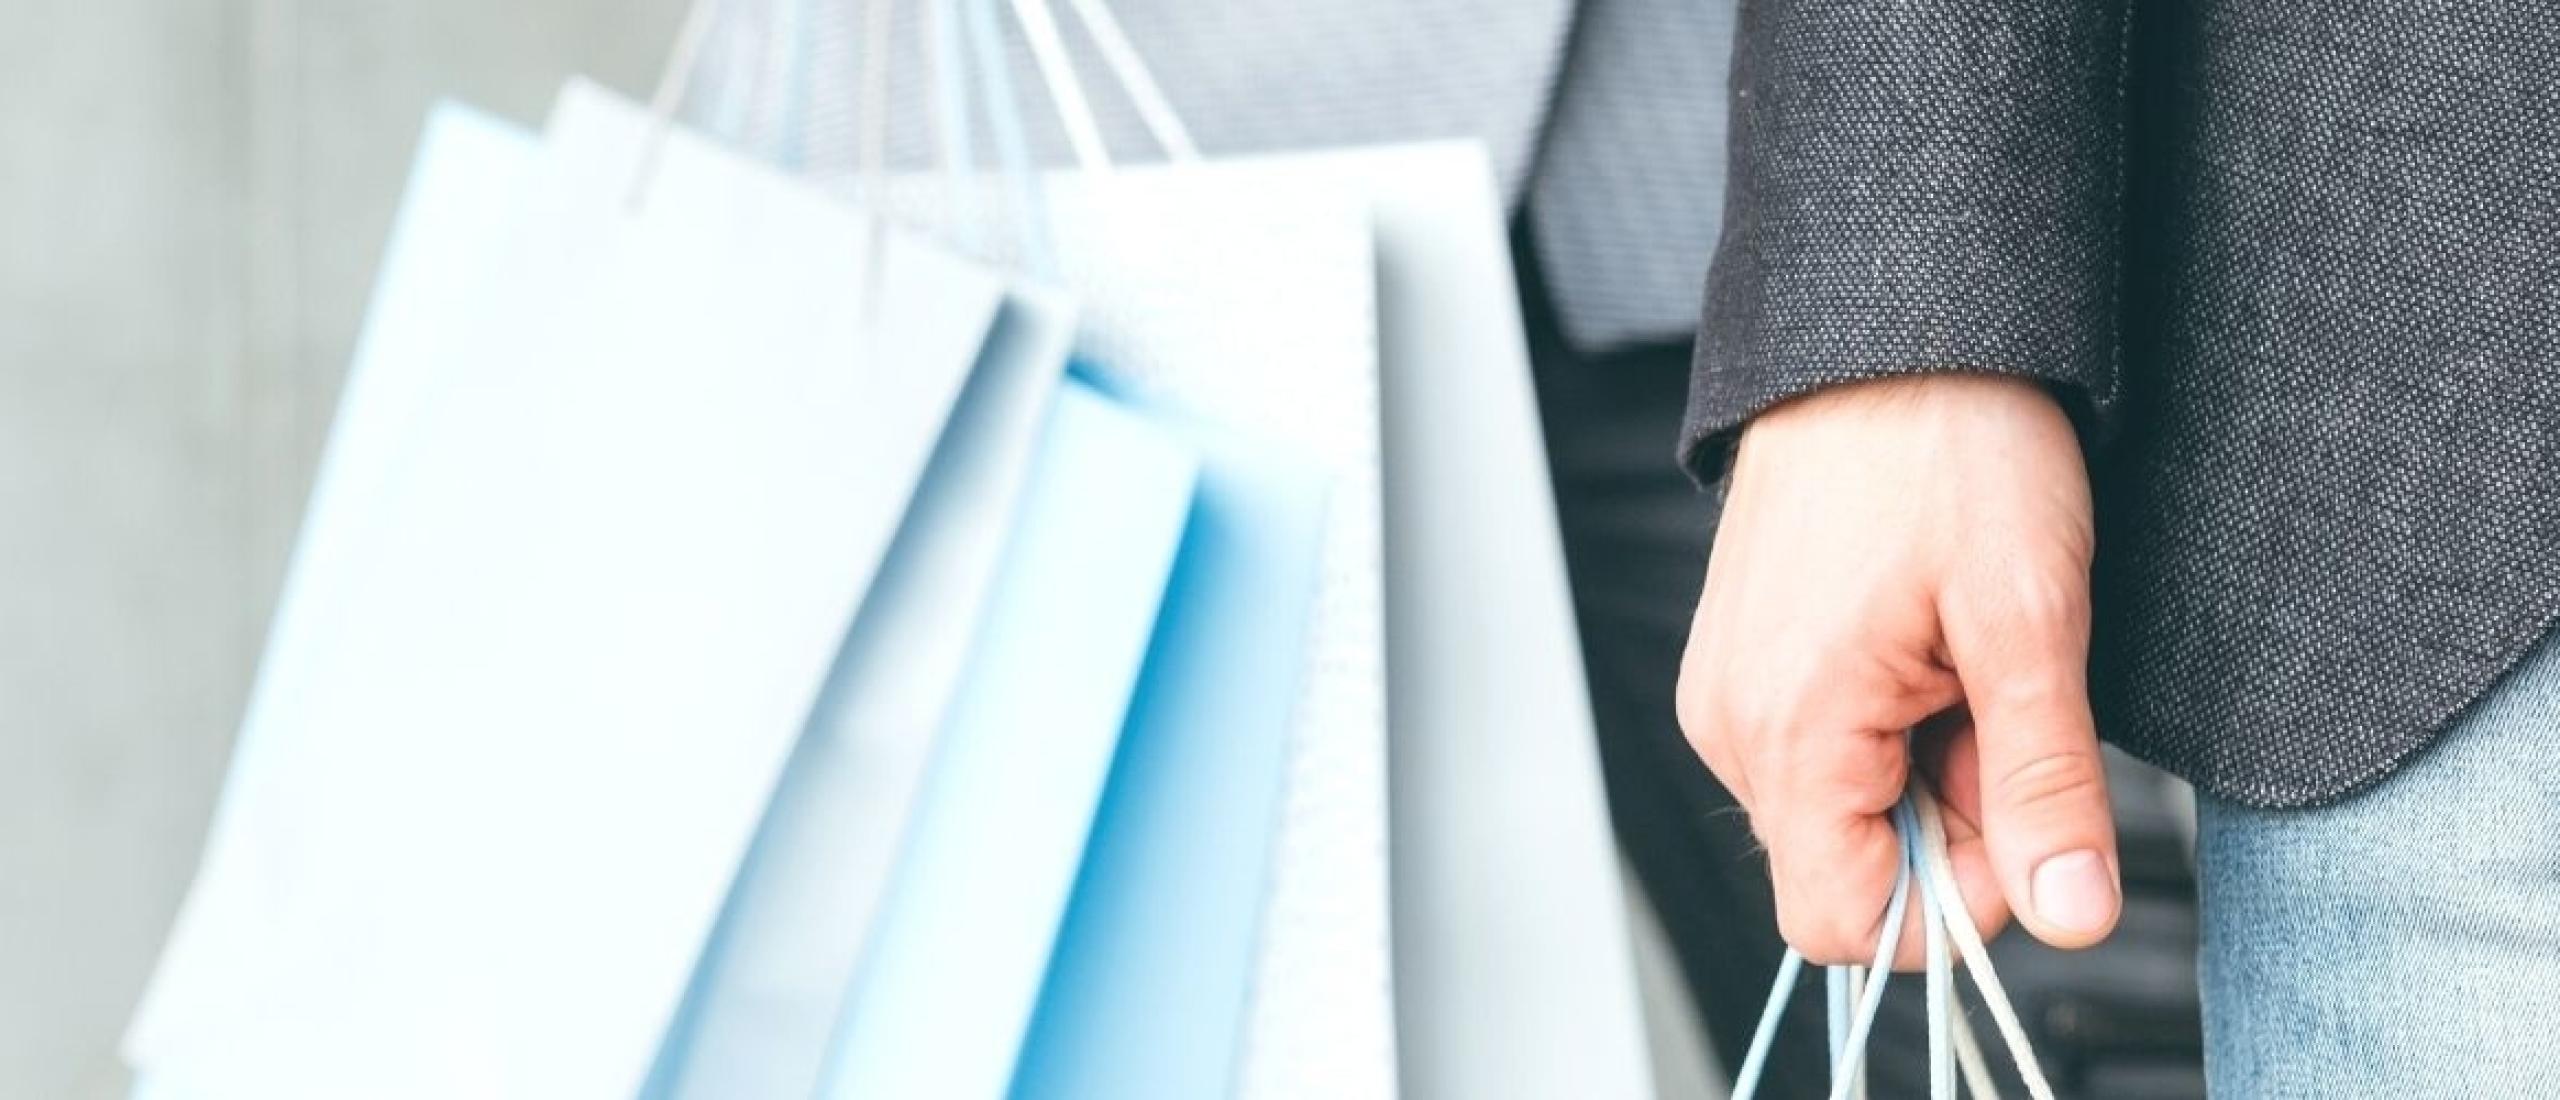 Hoe werkt affiliate marketing via Amazon?